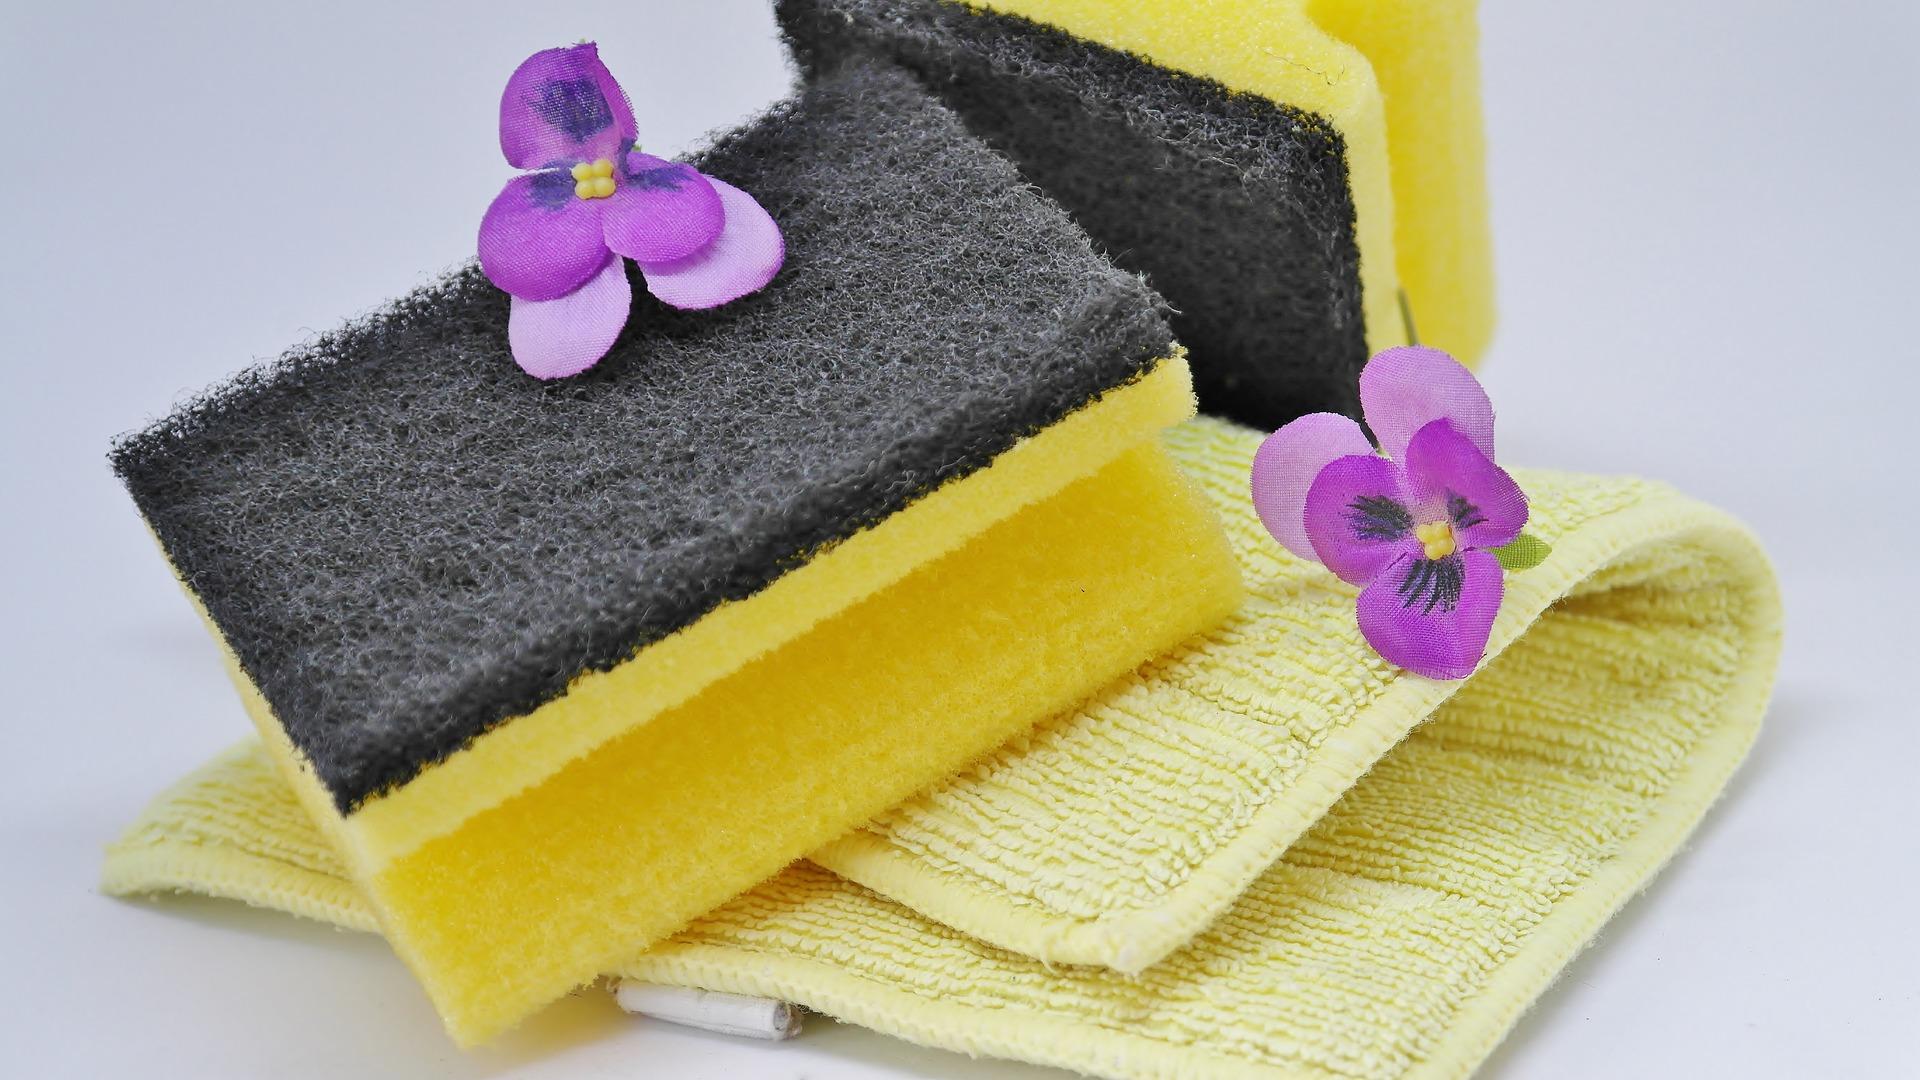 Spring Cleaning Checklist Bremerton, WA